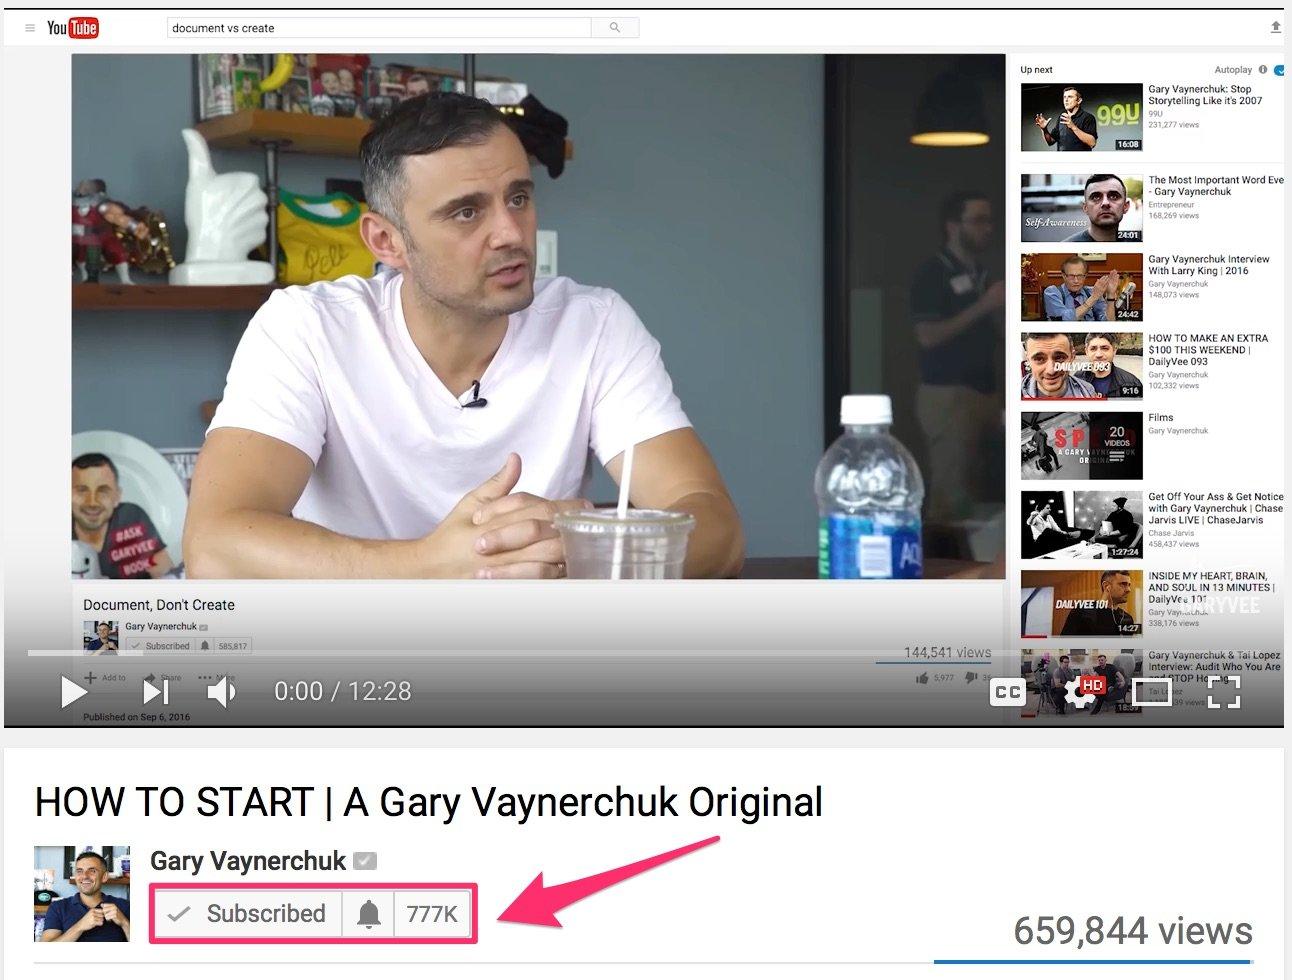 1 HOW TO START A Gary Vaynerchuk Original YouTube